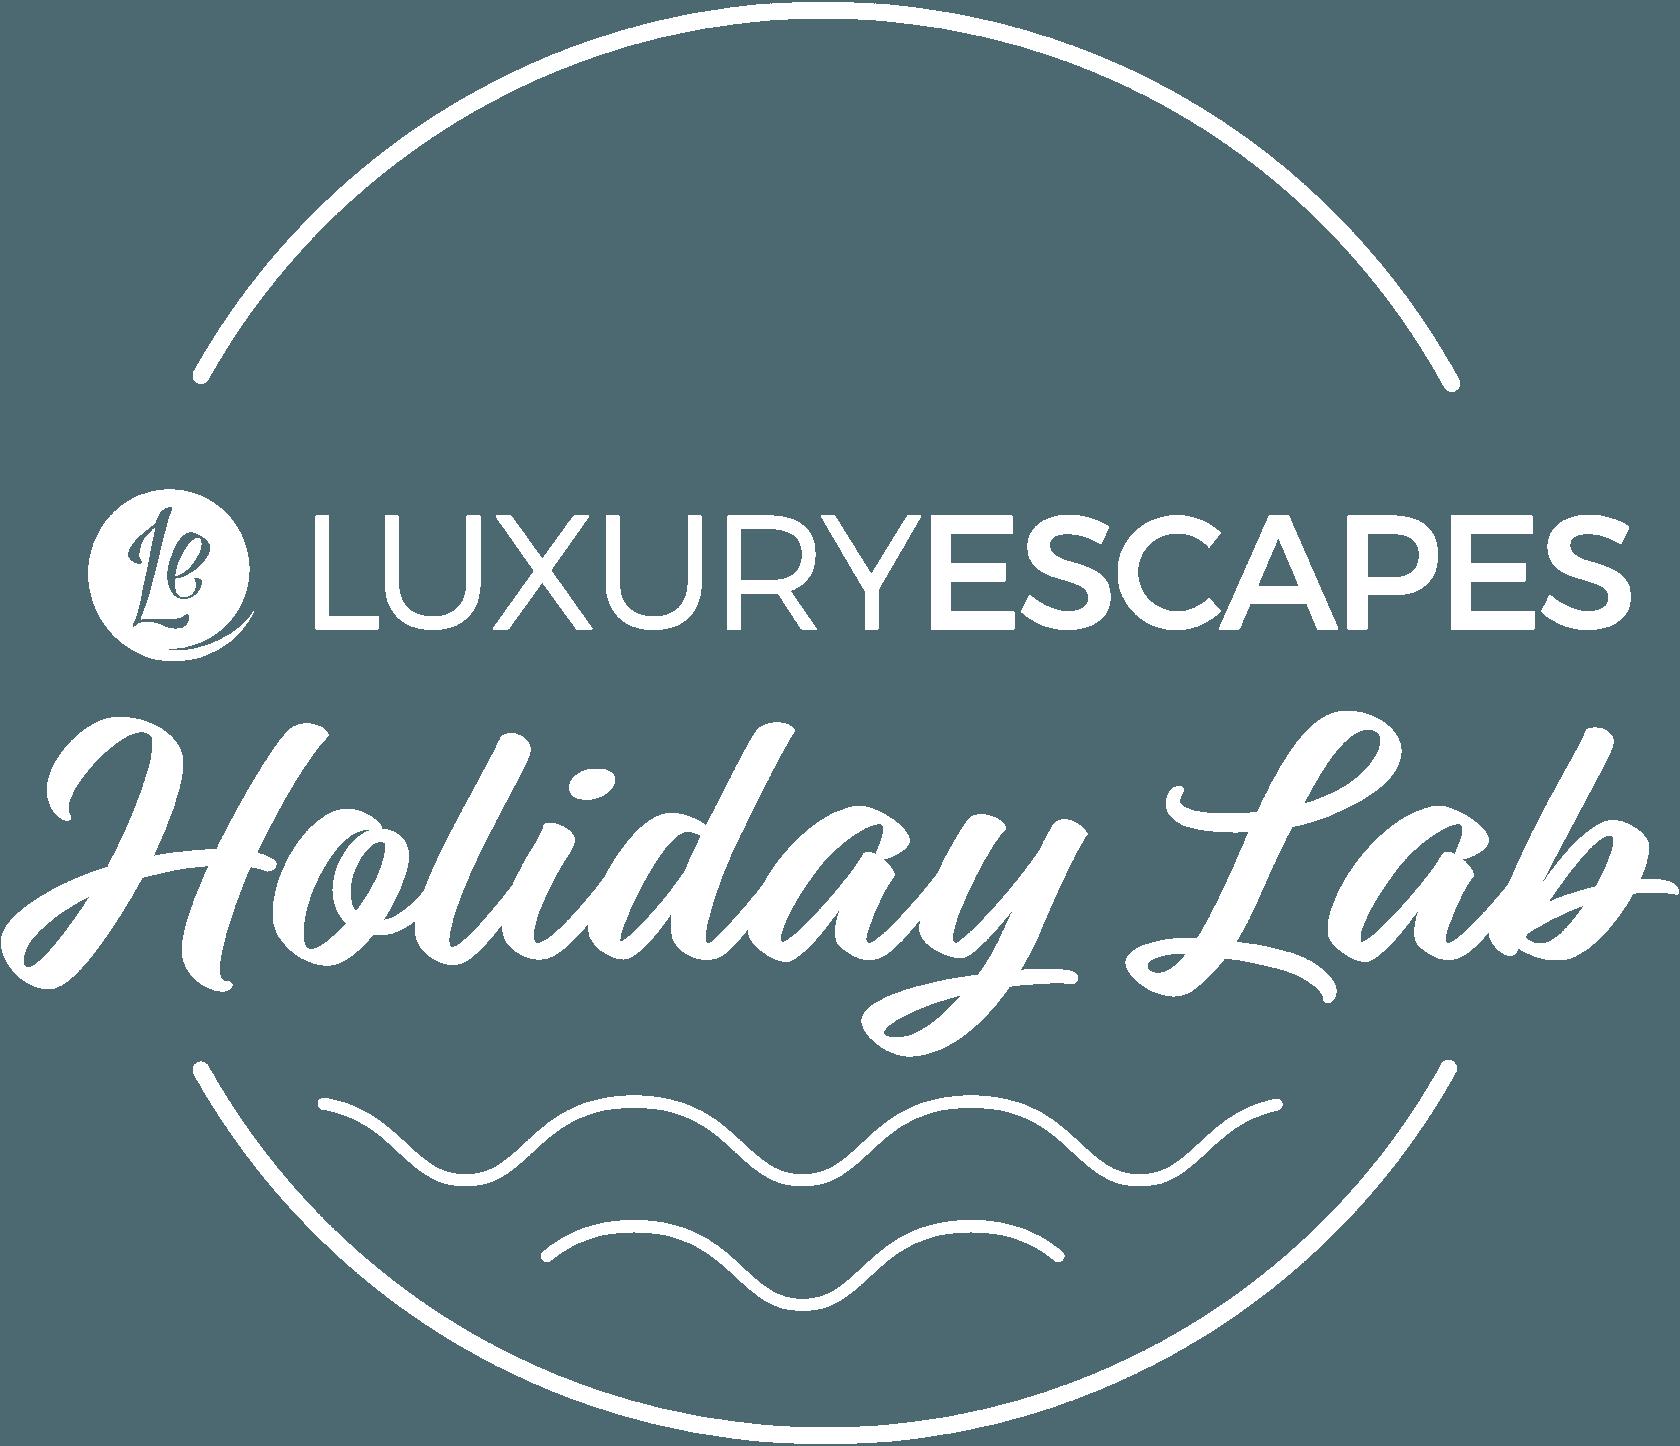 Holiday Lab